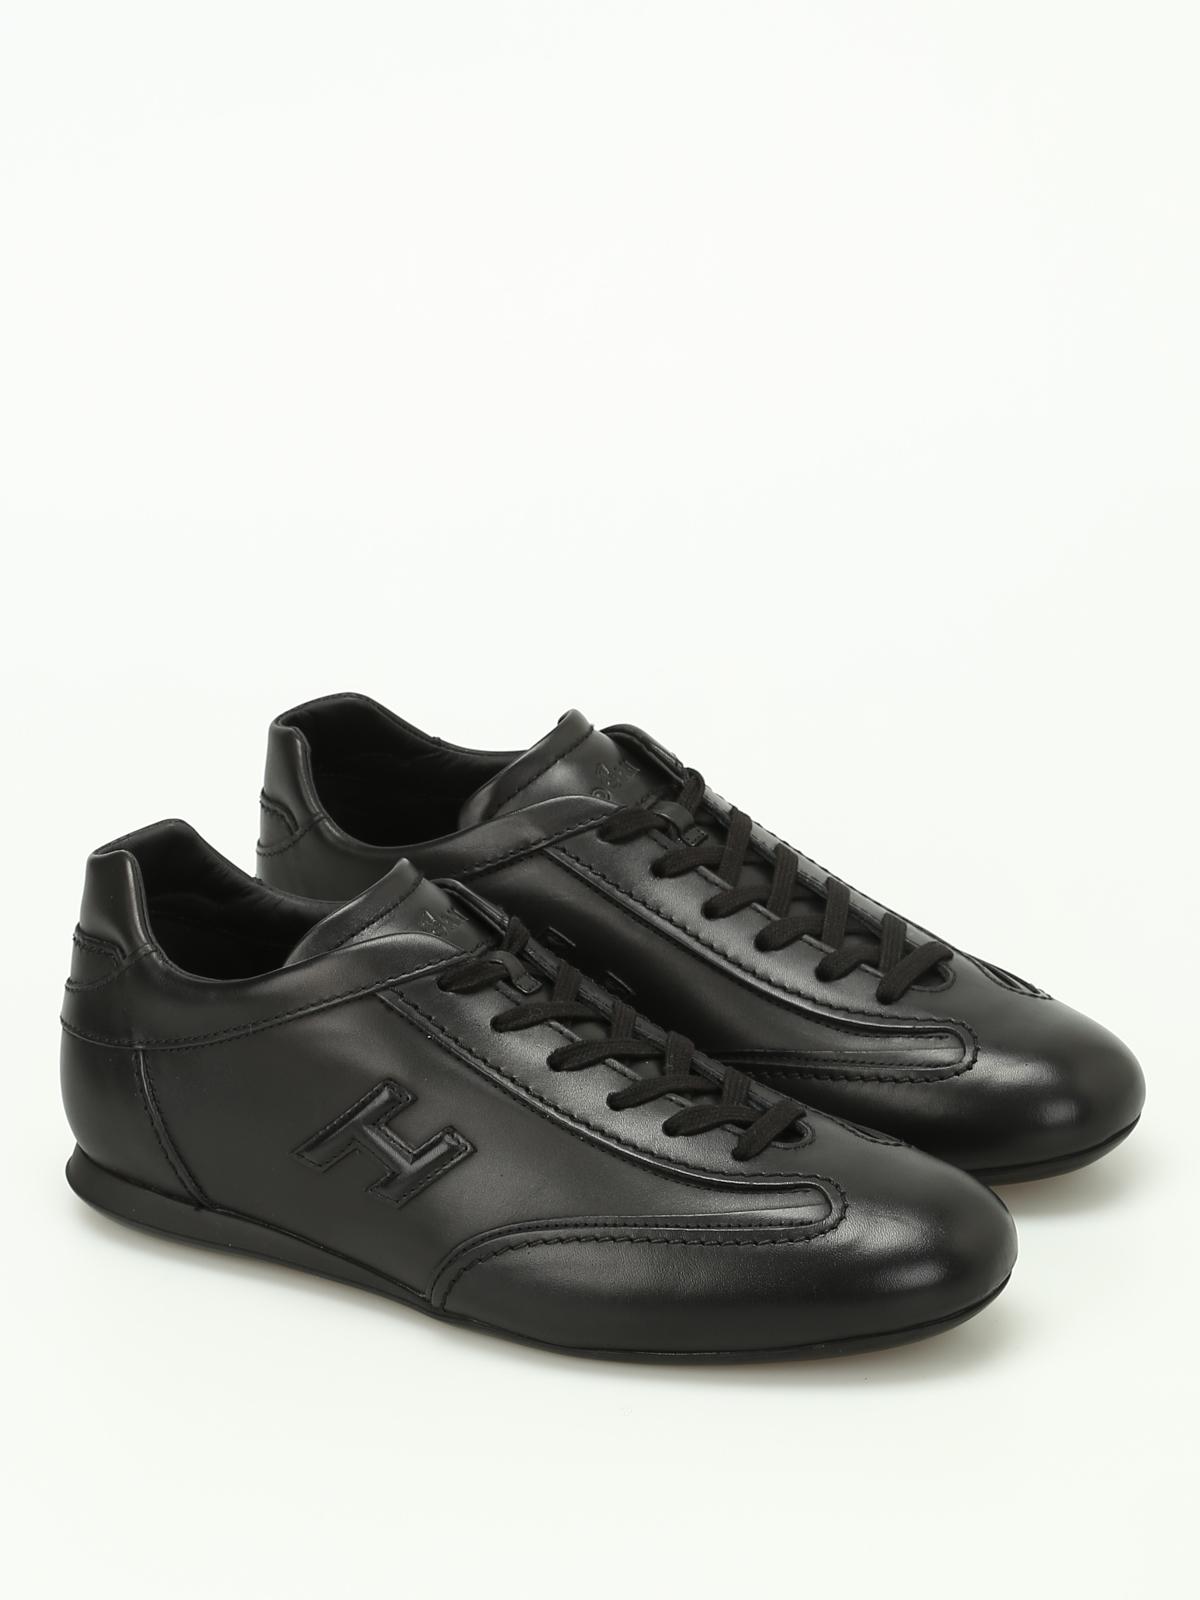 Trainers Hogan - Olympia black leather sneakers - HXM0570I9721POB999